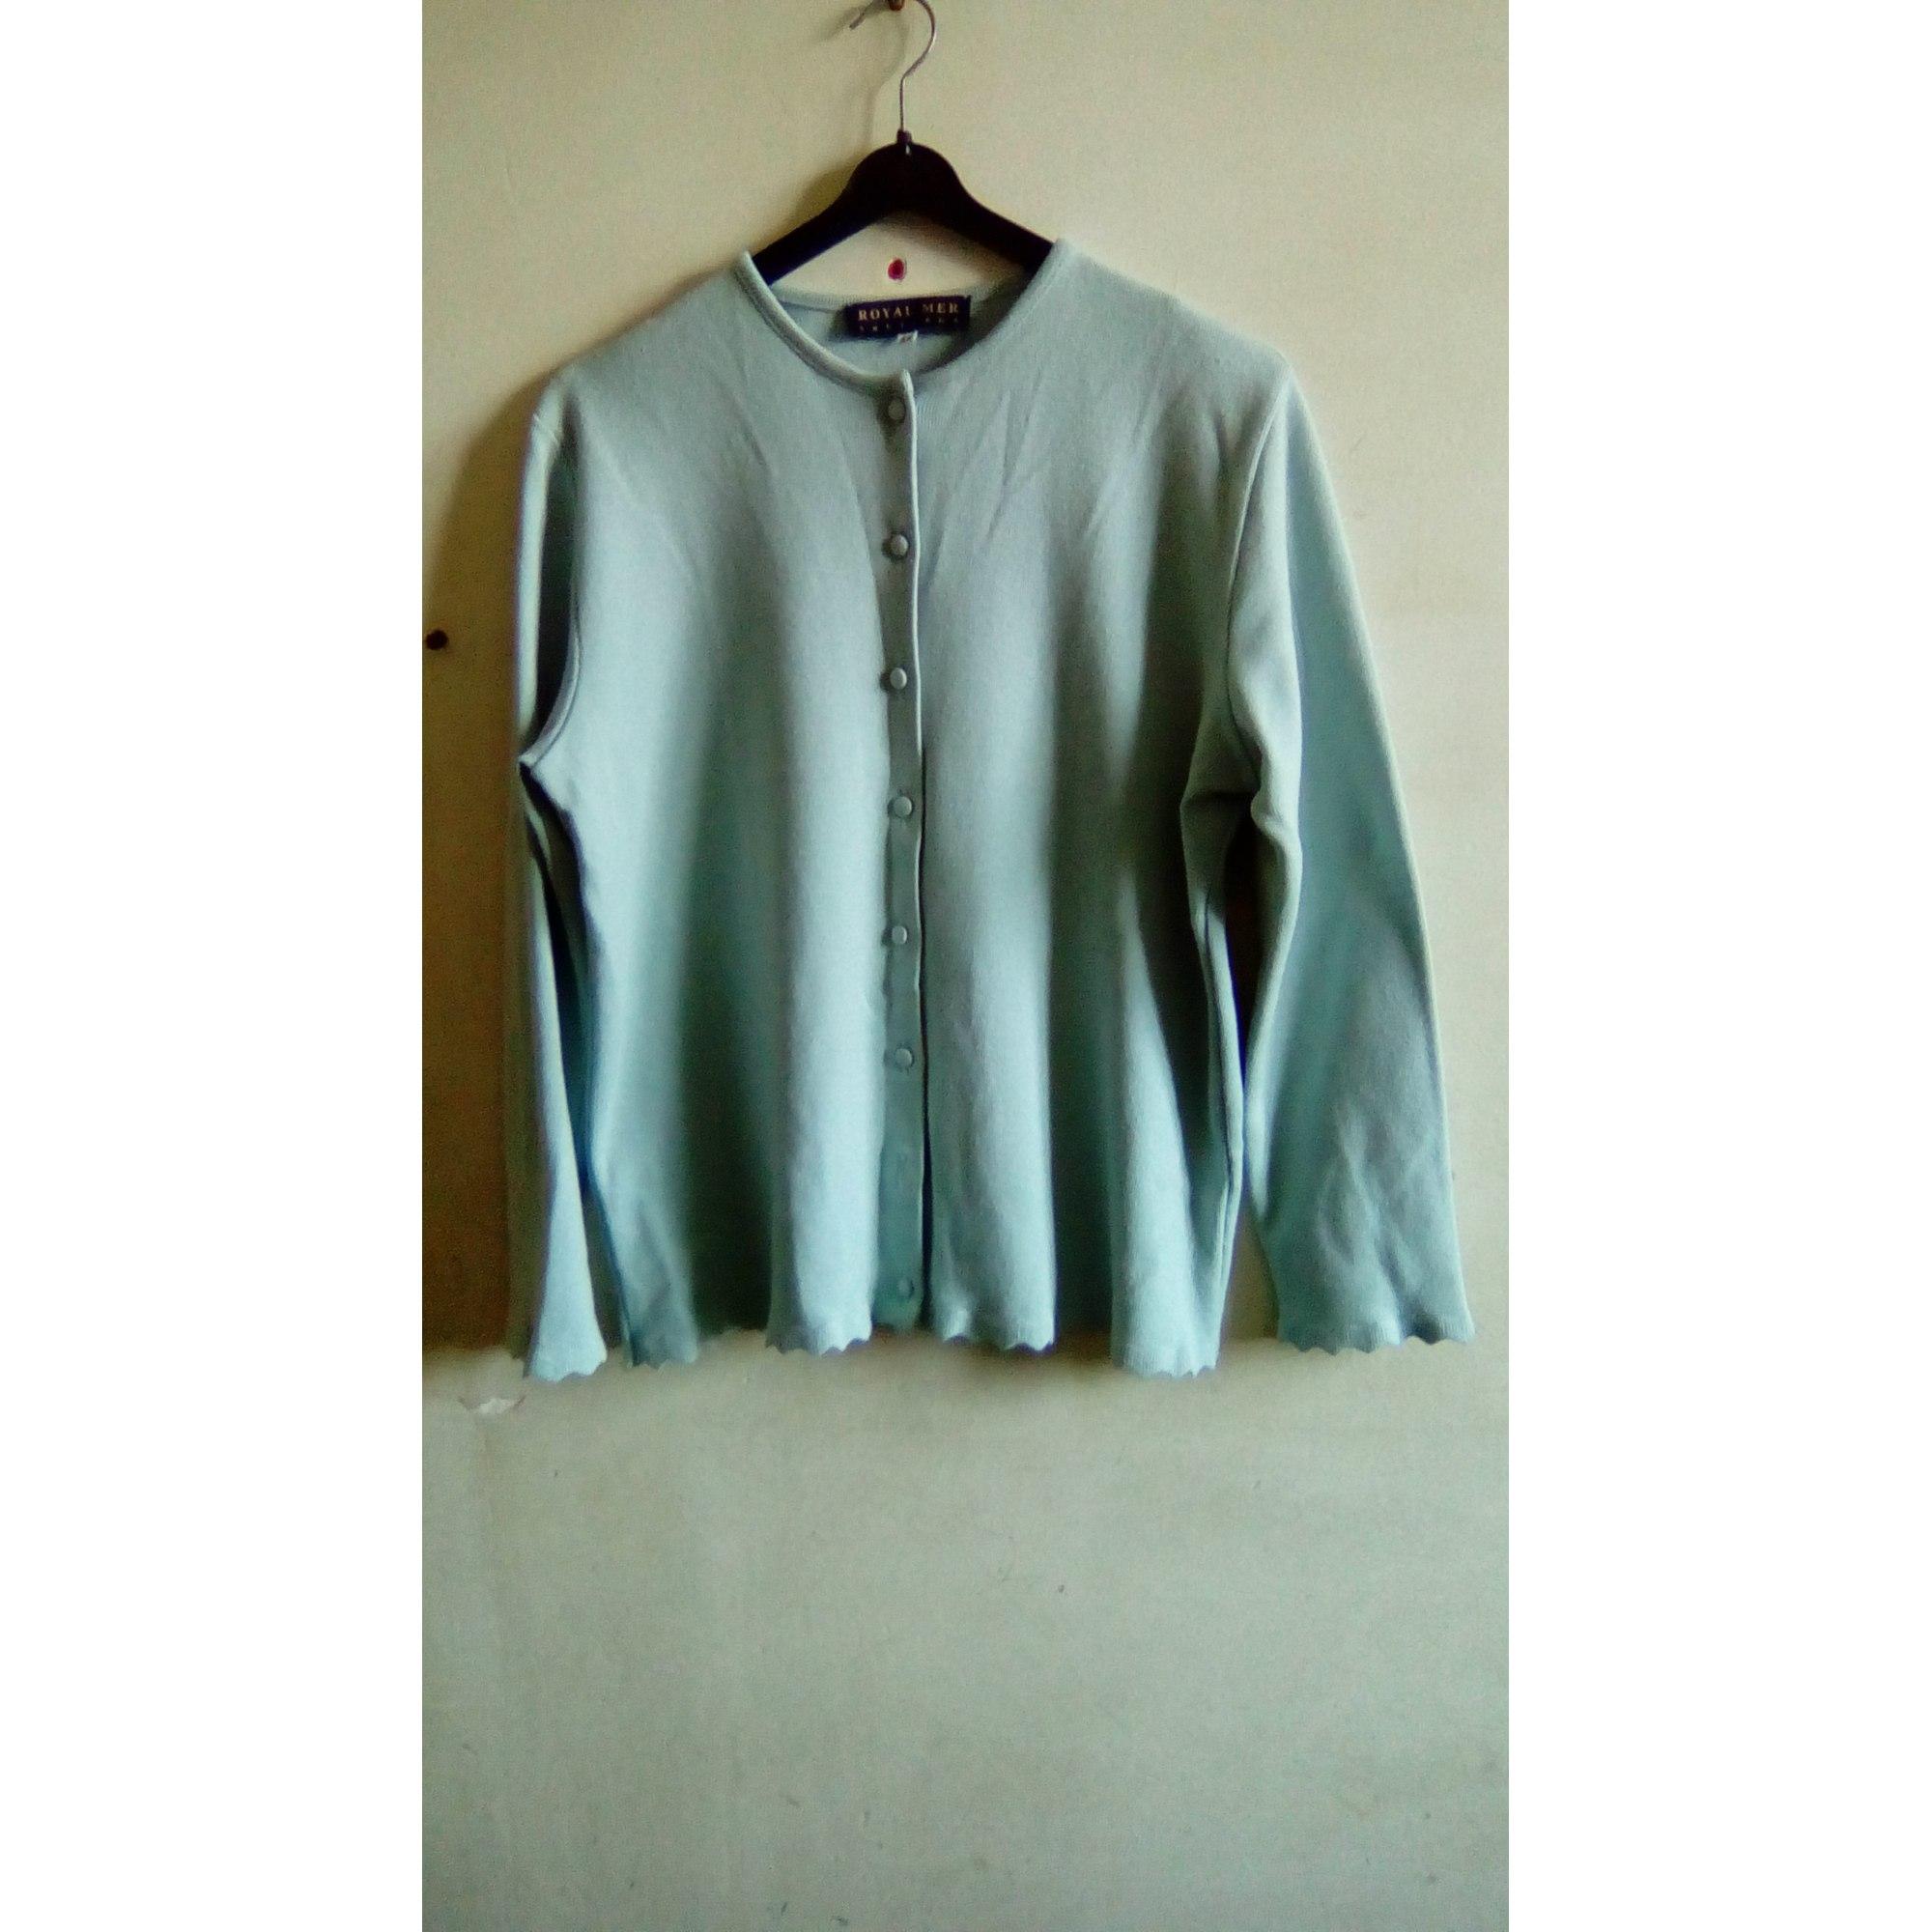 Gilet, cardigan ROYAL MER BRETAGNE Bleu, bleu marine, bleu turquoise